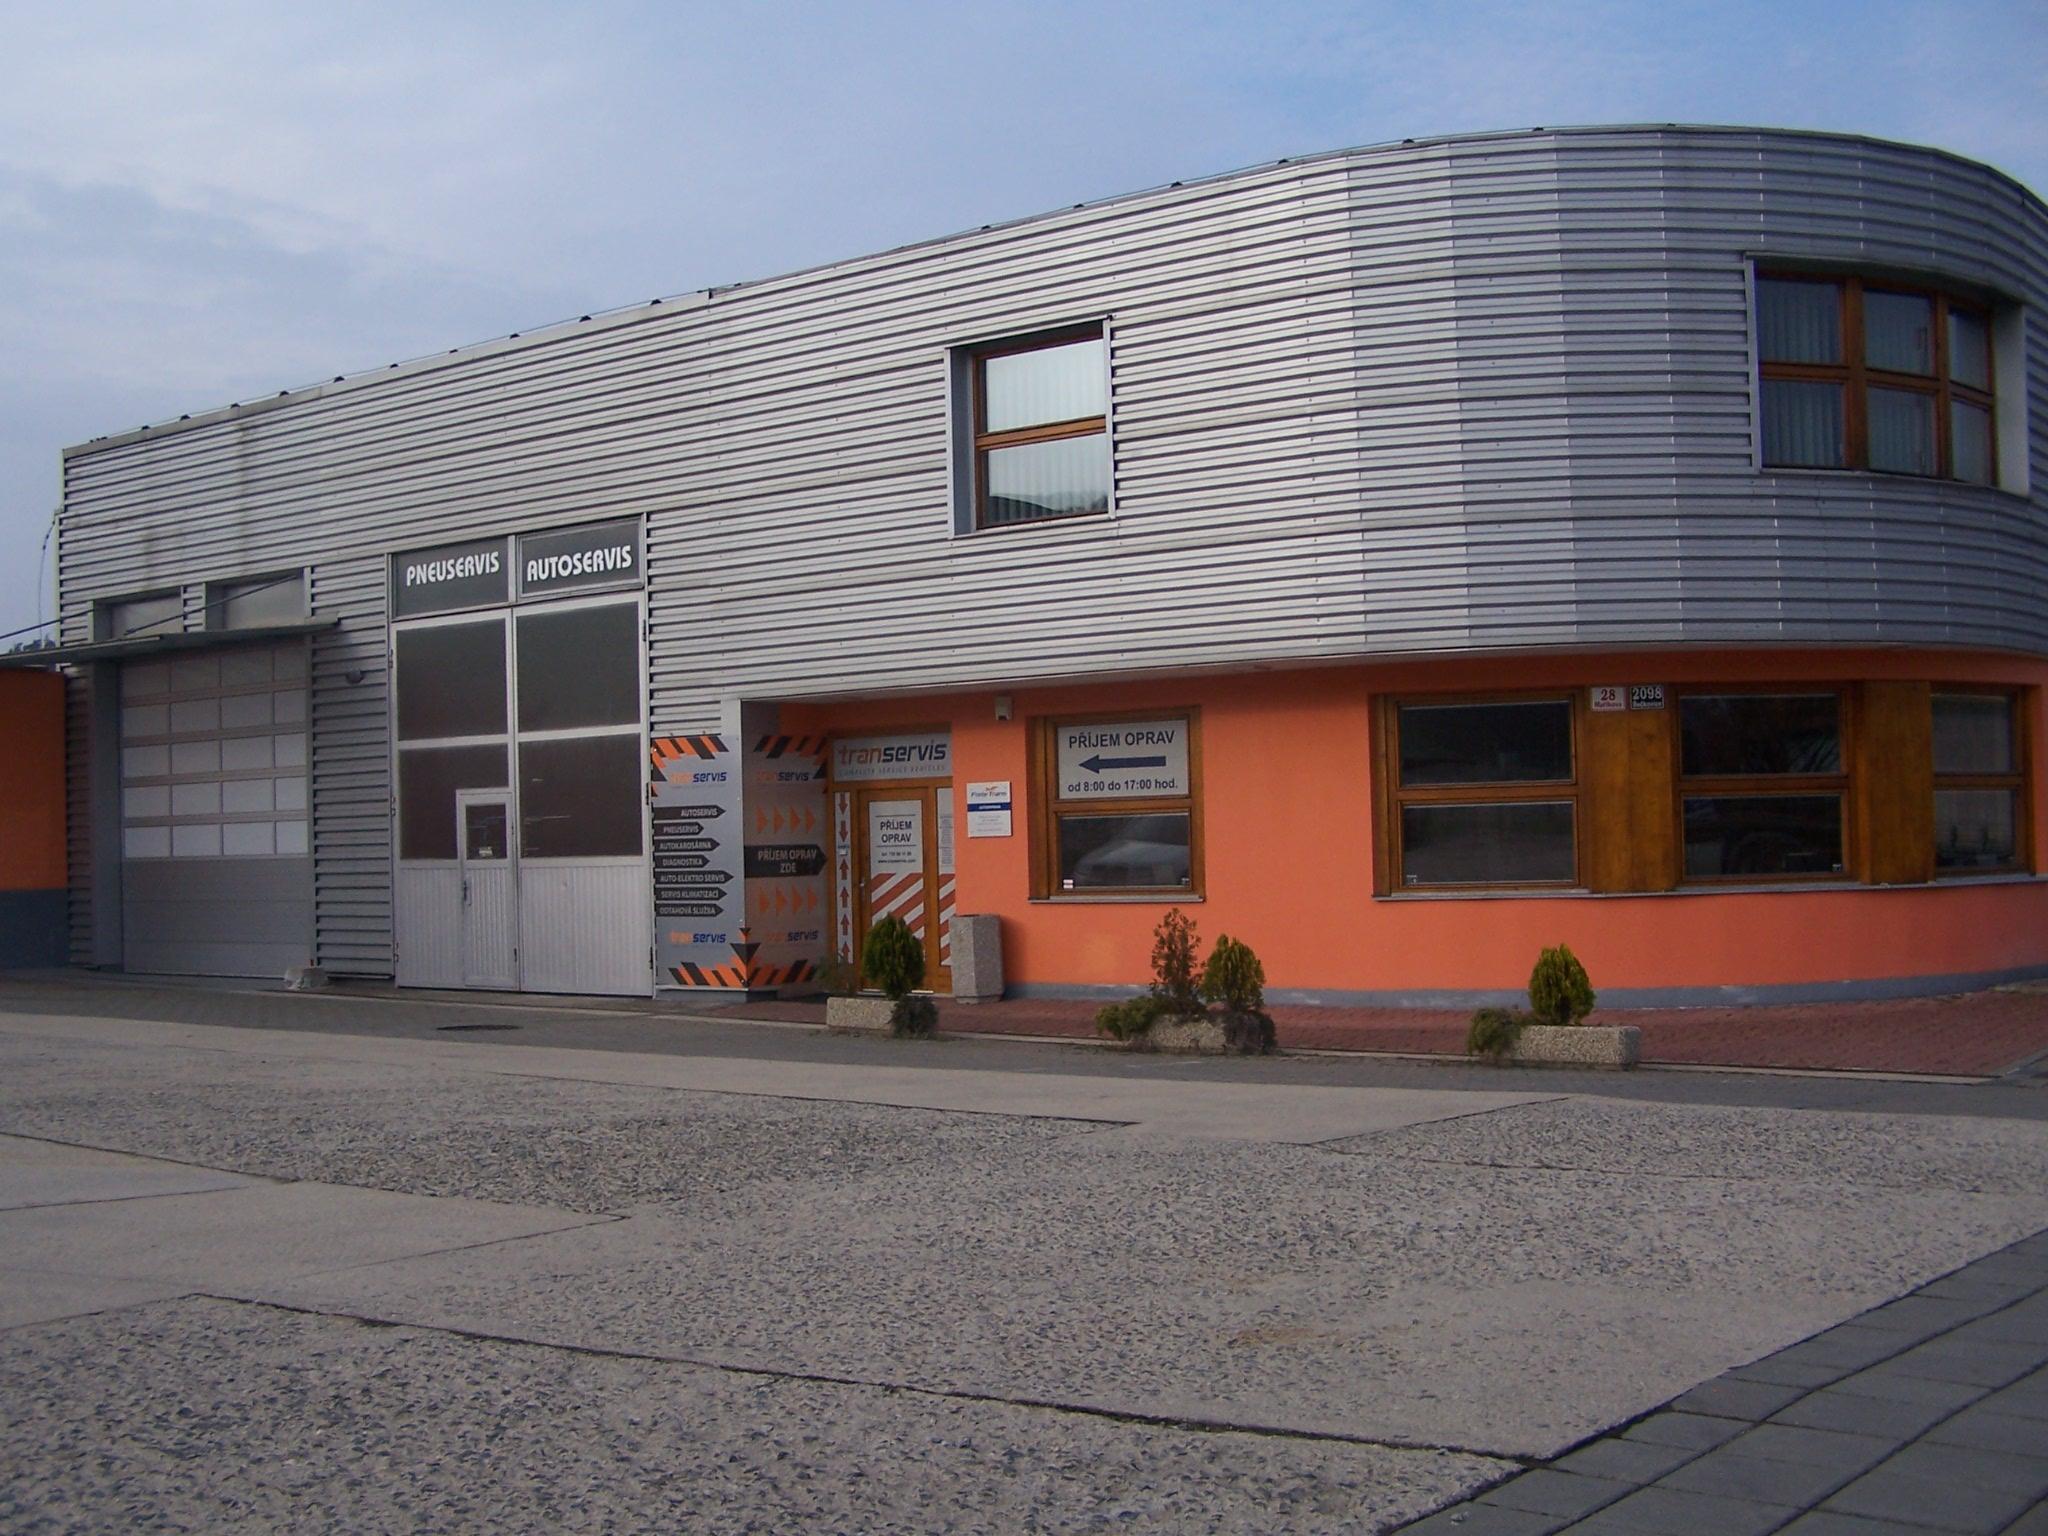 http://www.cesko-katalog.cz/galerie/transervis-s-r-o-1427384481.